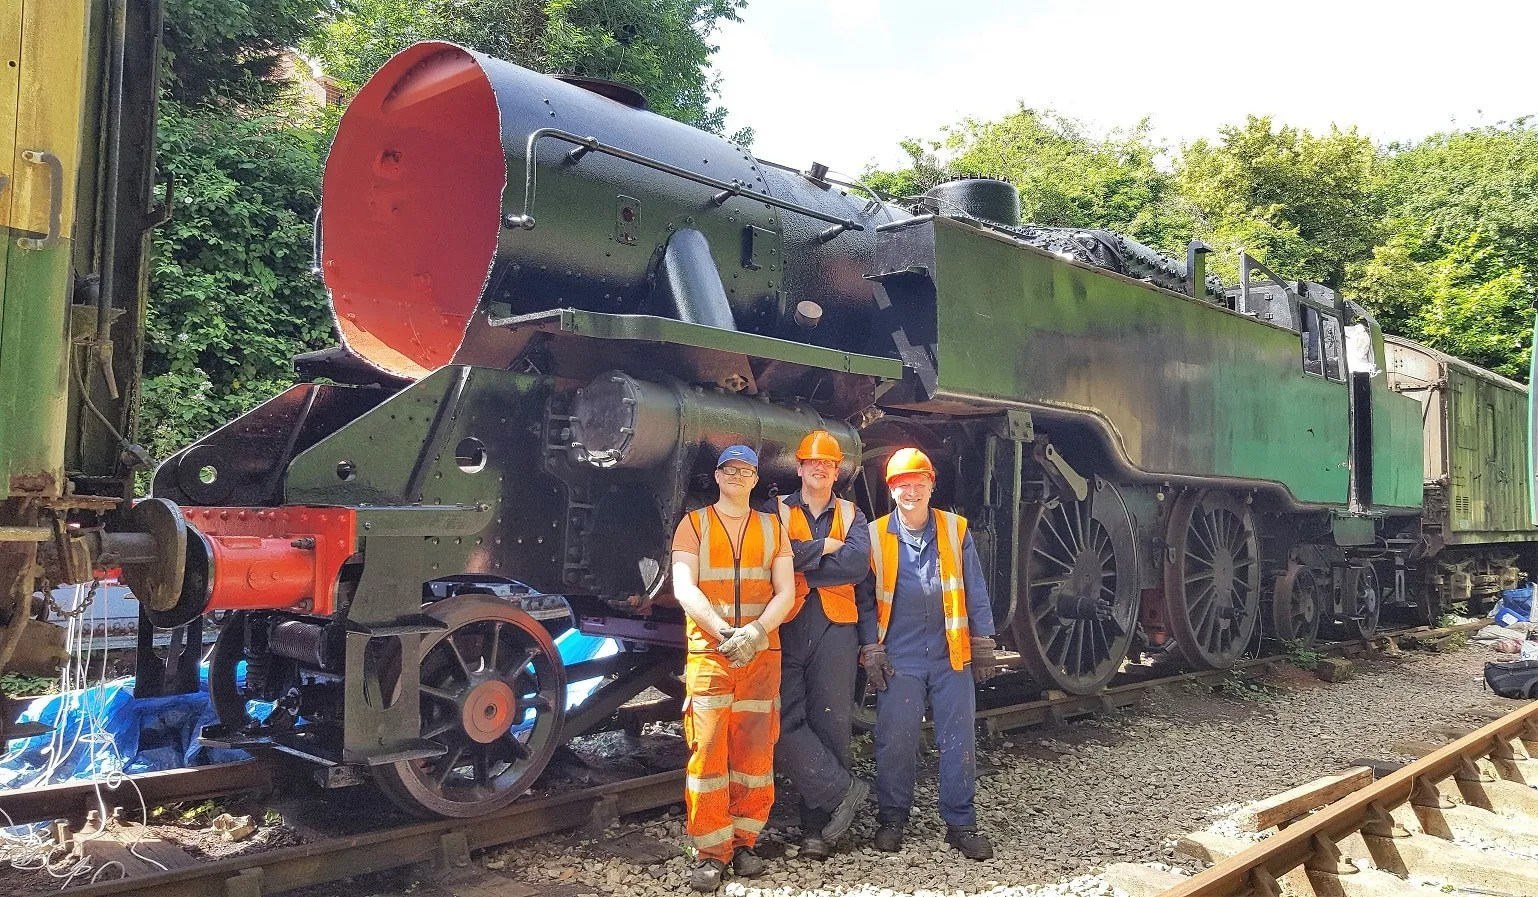 80150 at Alresford railway station on the Mid Hants Railway